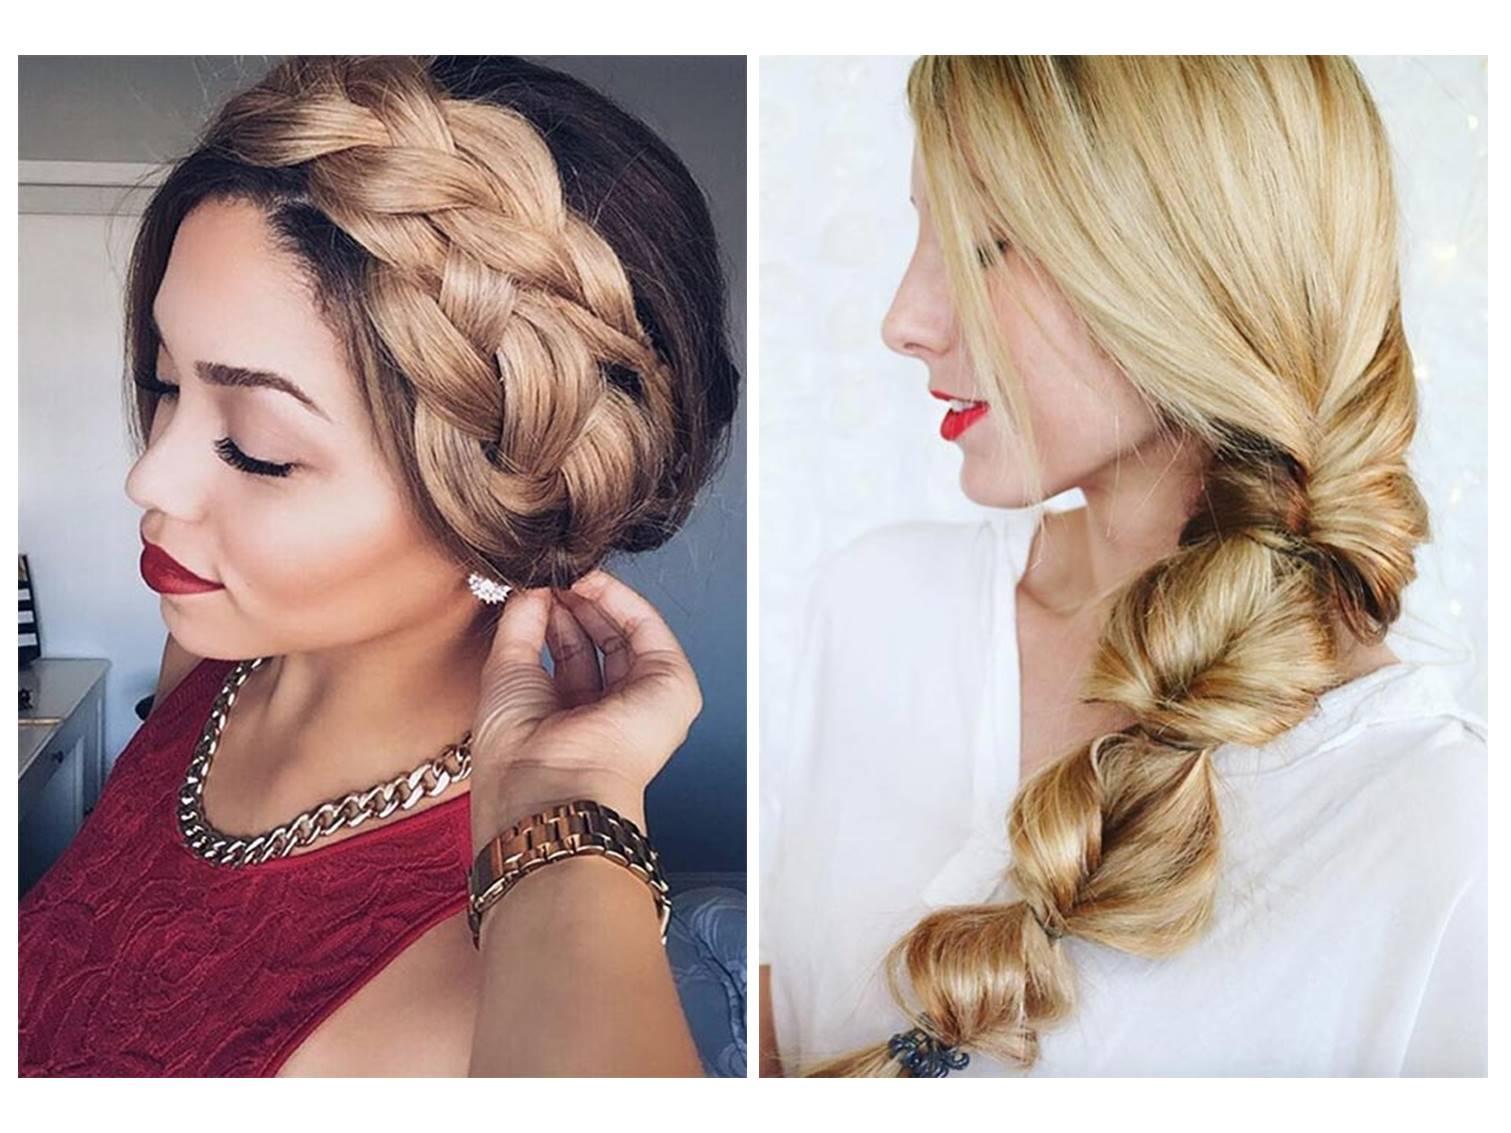 holiday hairstyles for long hair beach holiday hairstyles, easy holiday updos for long hair, medium length hair